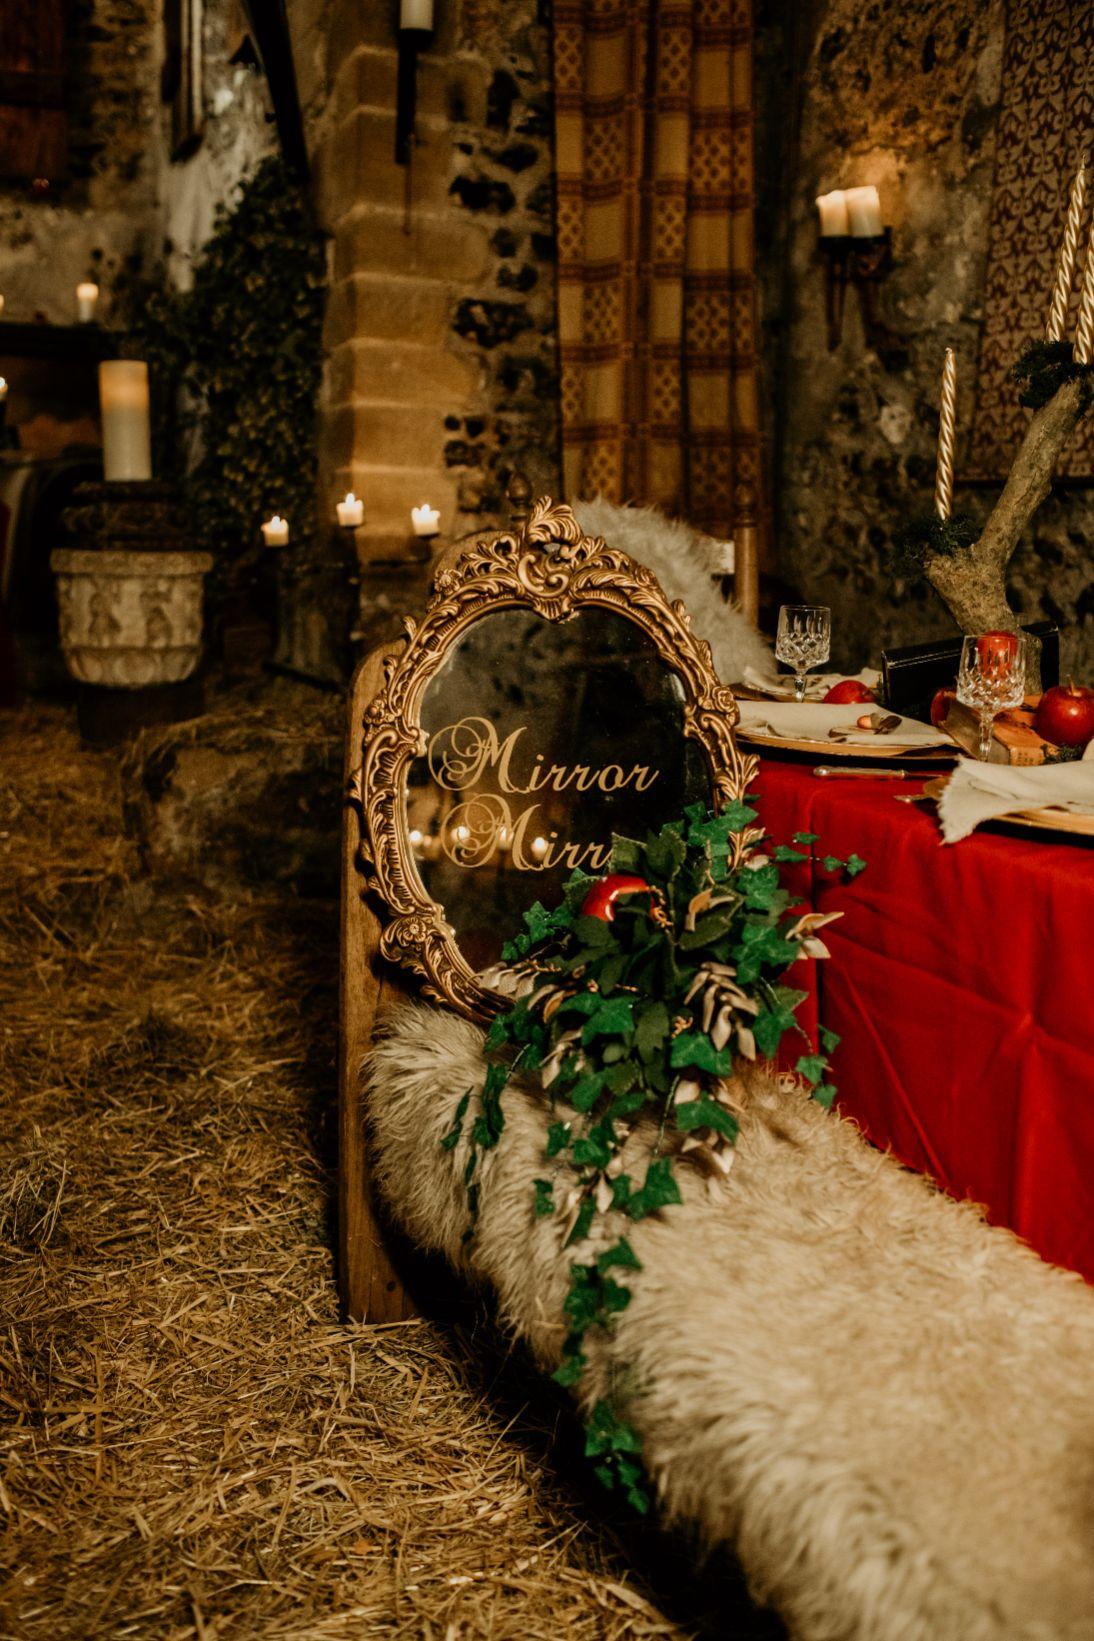 alternative fairytale wedding- snow white wedding- charlotte laurie designs-chloe mary photo- unconventional wedding- alternative wedding inspiration- snow white wedding